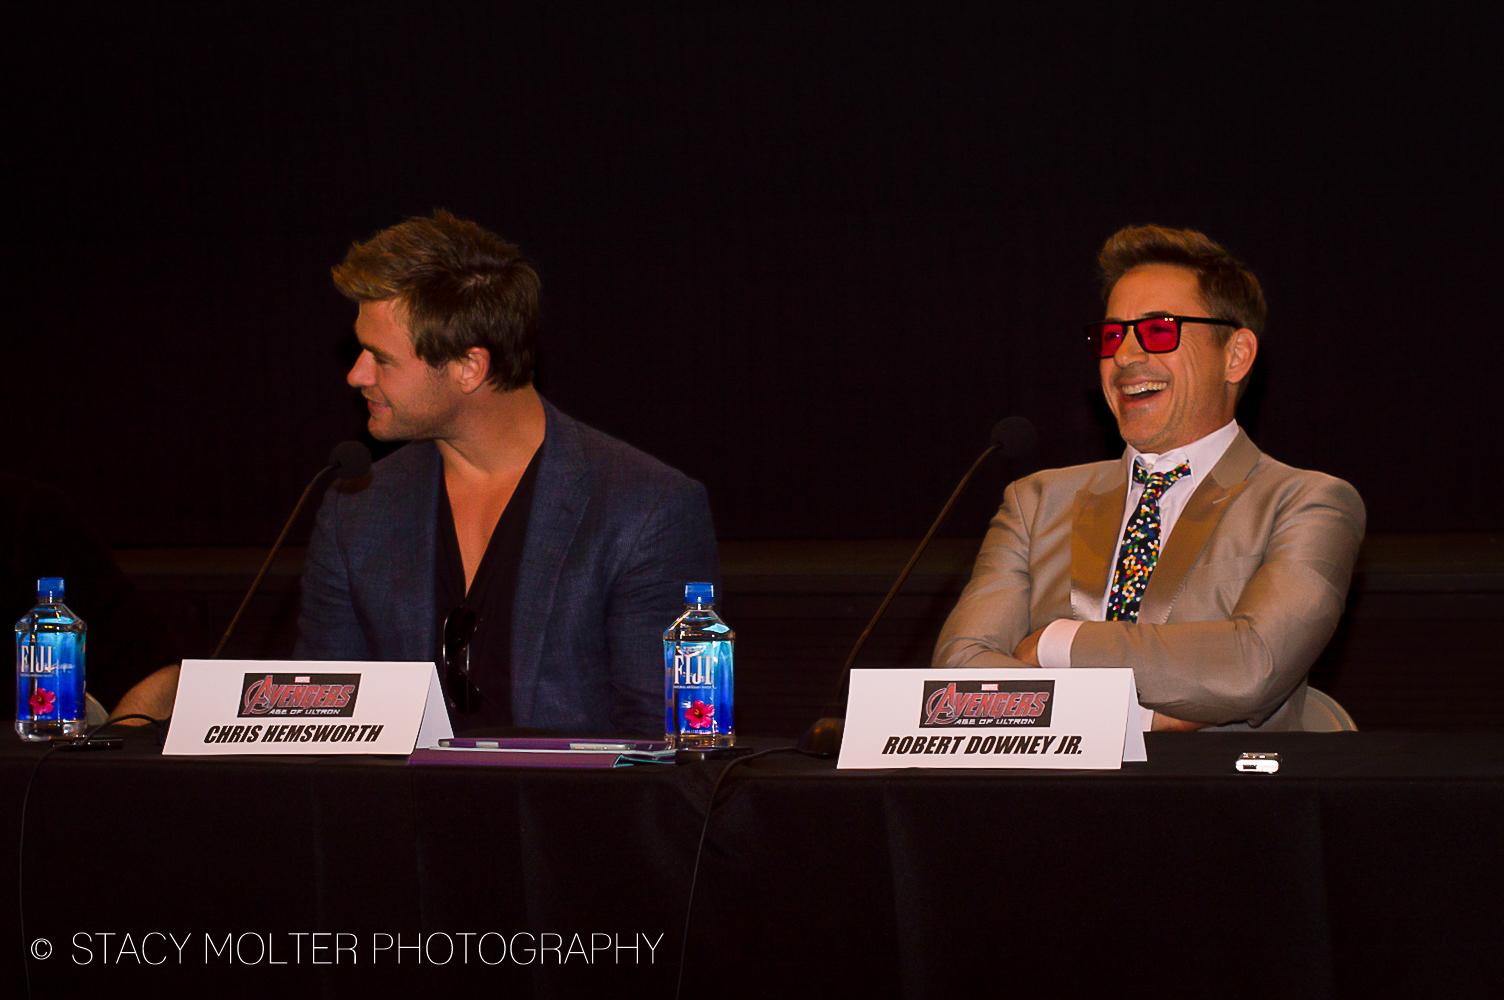 Chris Hemsworth & Robert Downey Jr. - Avengers Age of Ultron Press Conference Junket